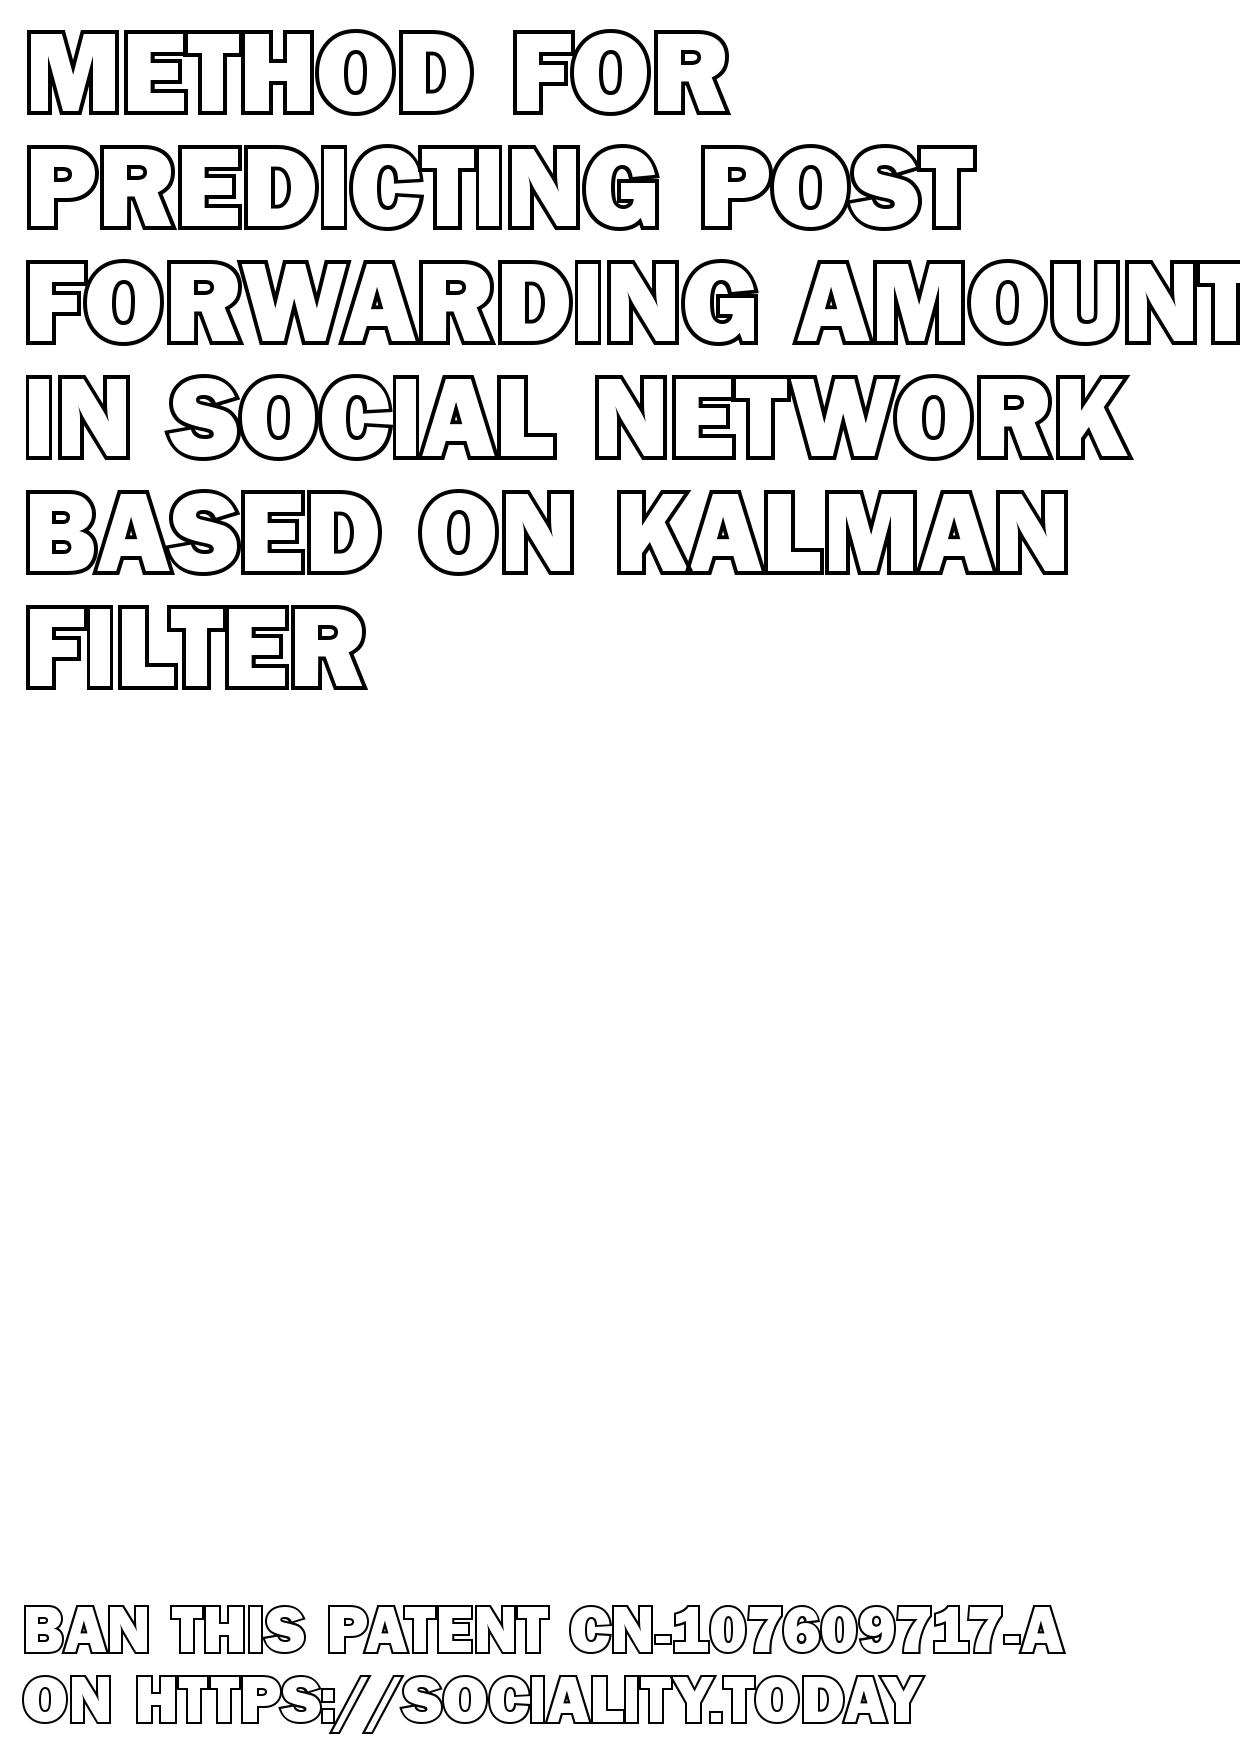 Method for predicting post forwarding amount in social network based on Kalman filter  - CN-107609717-A